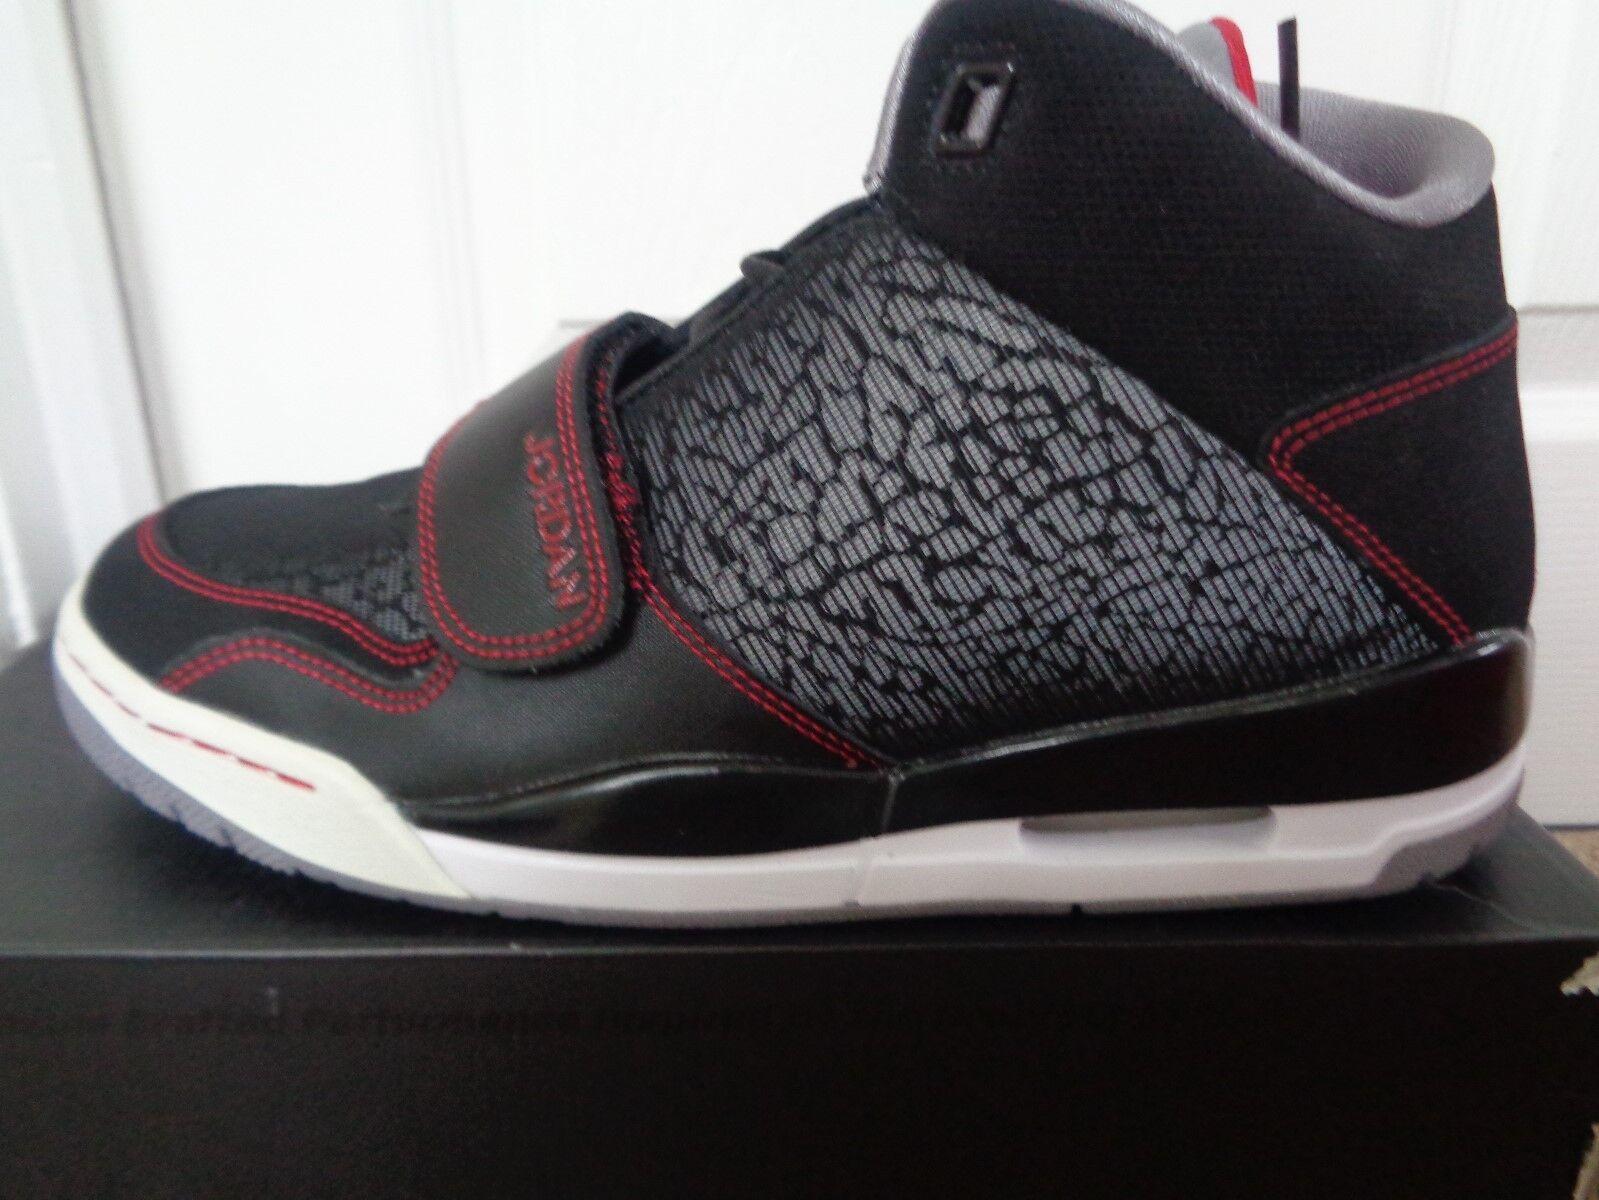 Nike Jordan FLTCLB 90'S trainers sneakers 602661 004 uk 7.5 eu 42 us 8.5 NEW+BOX